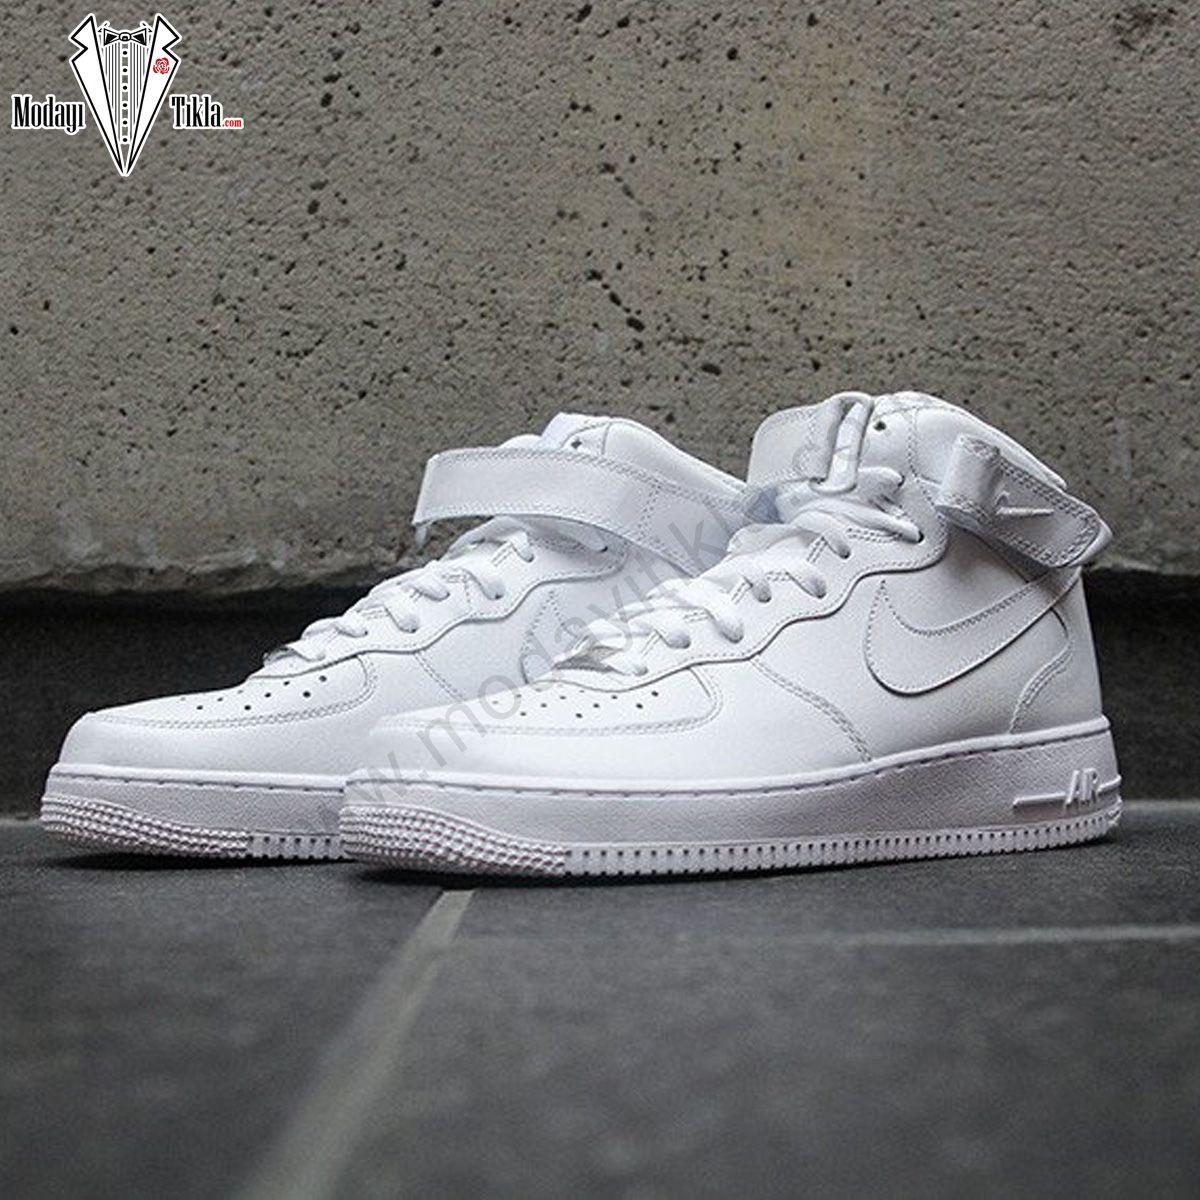 Nike Air Force High Beyaz Bogazli Nike Air Nike Air Force Nike